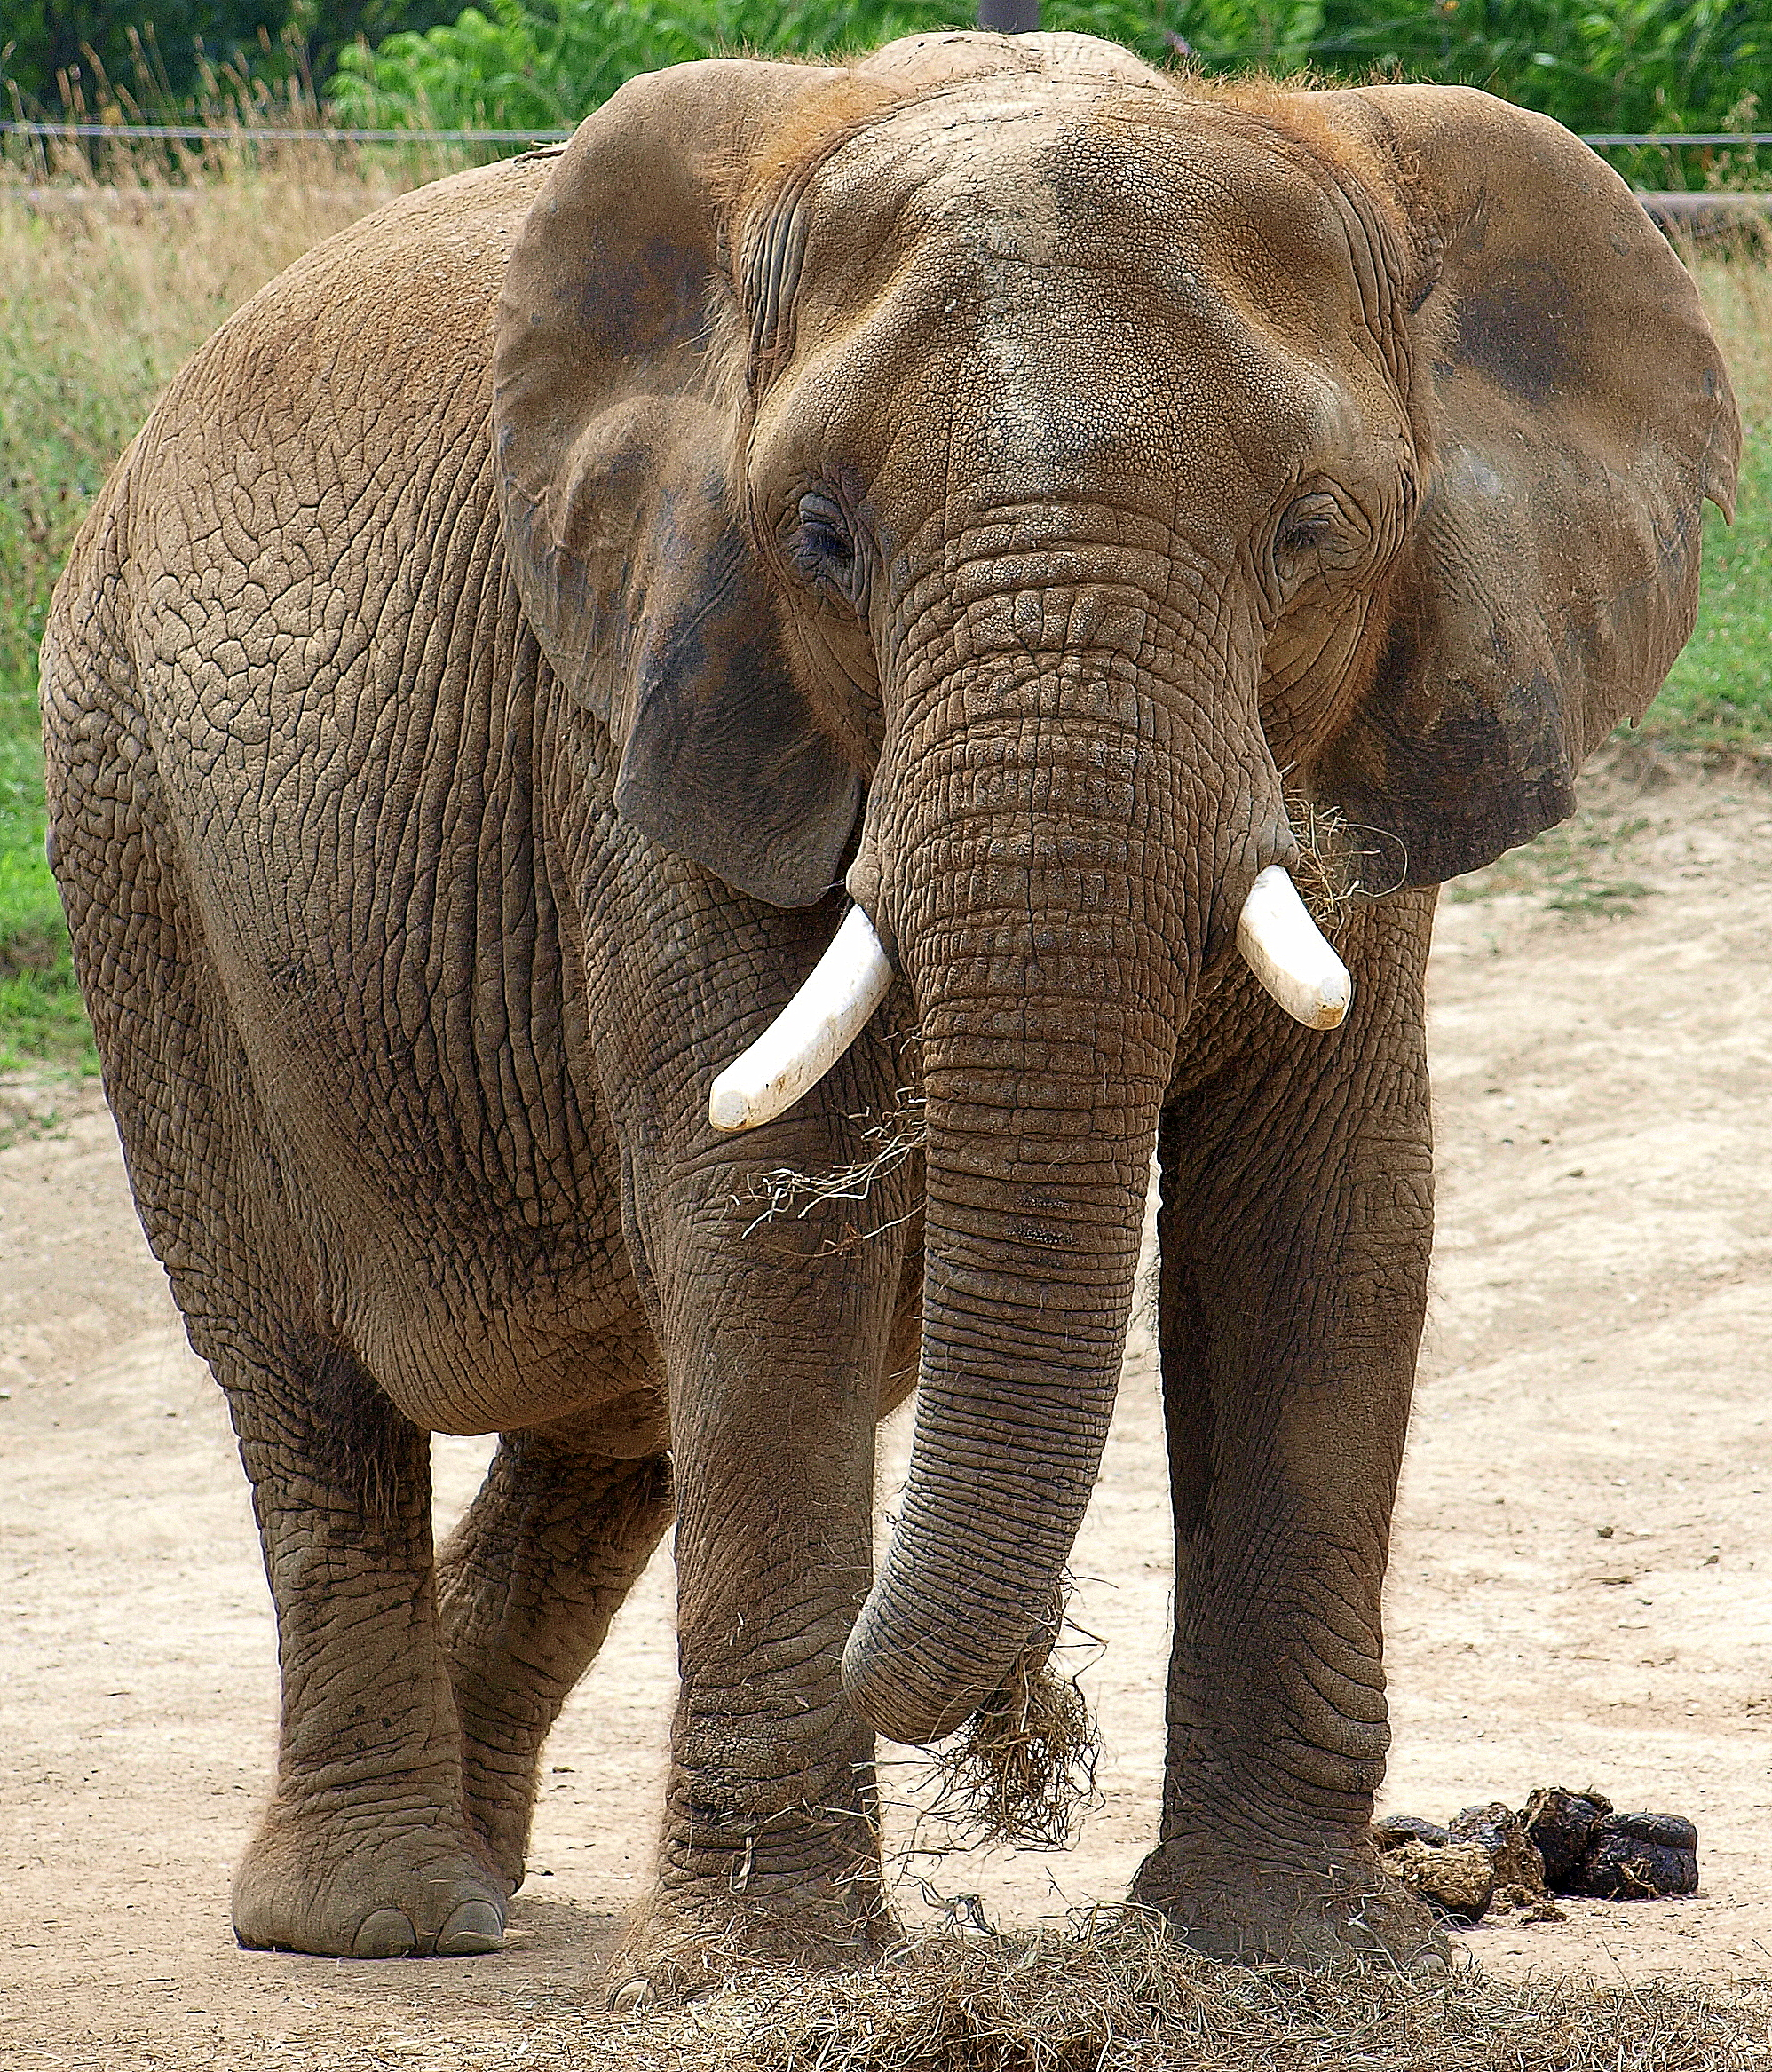 Indianapolis Zoo: File:Elephant At Indianapolis Zoo.jpg